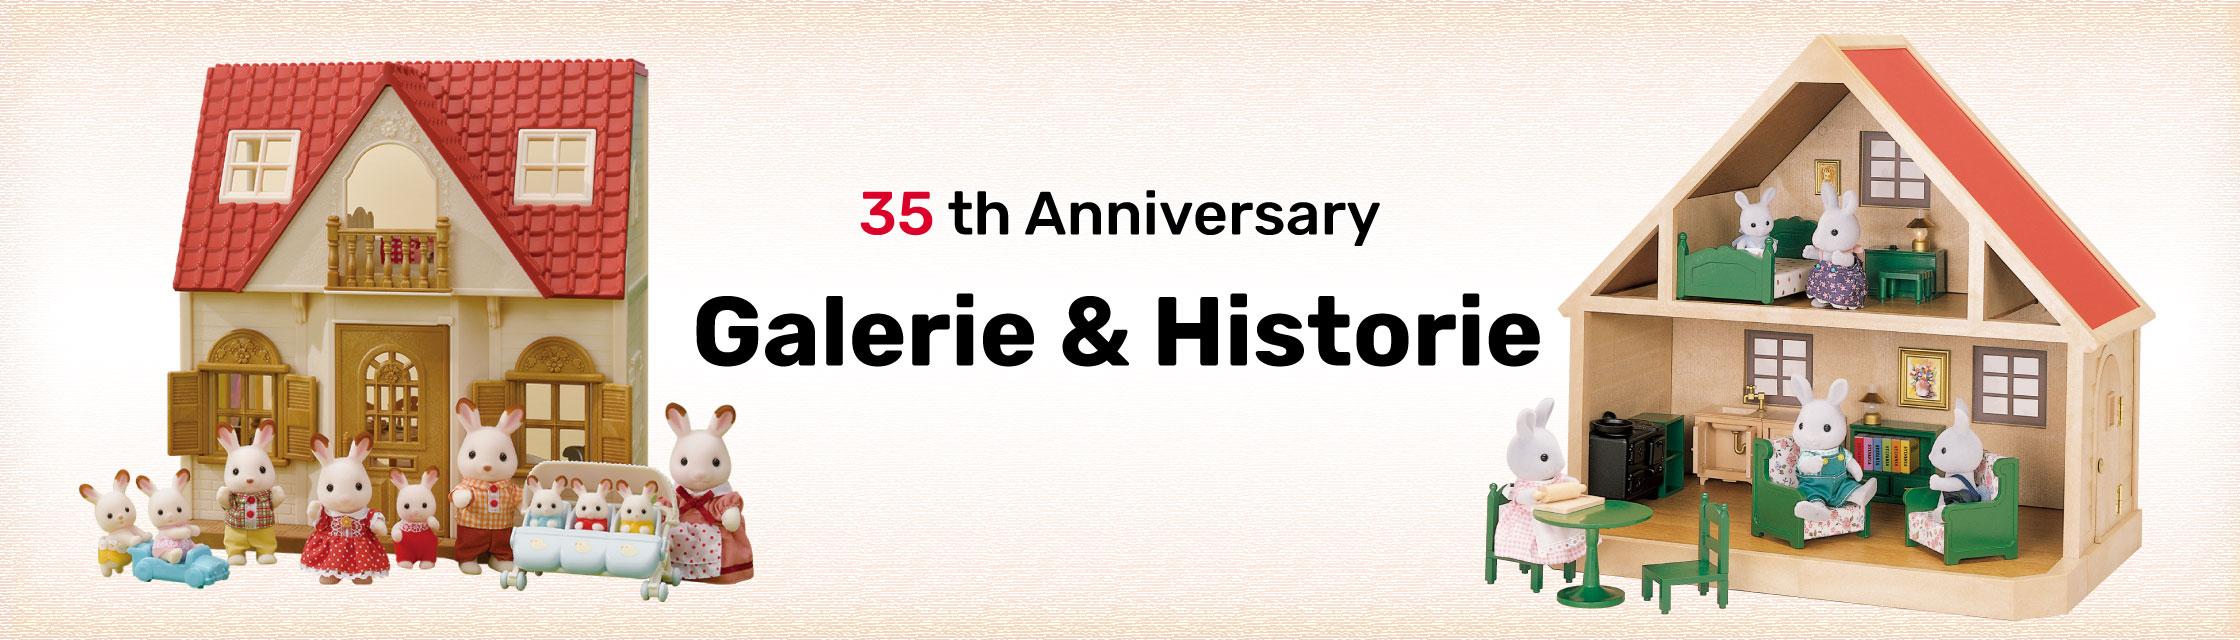 Galerie & Historie